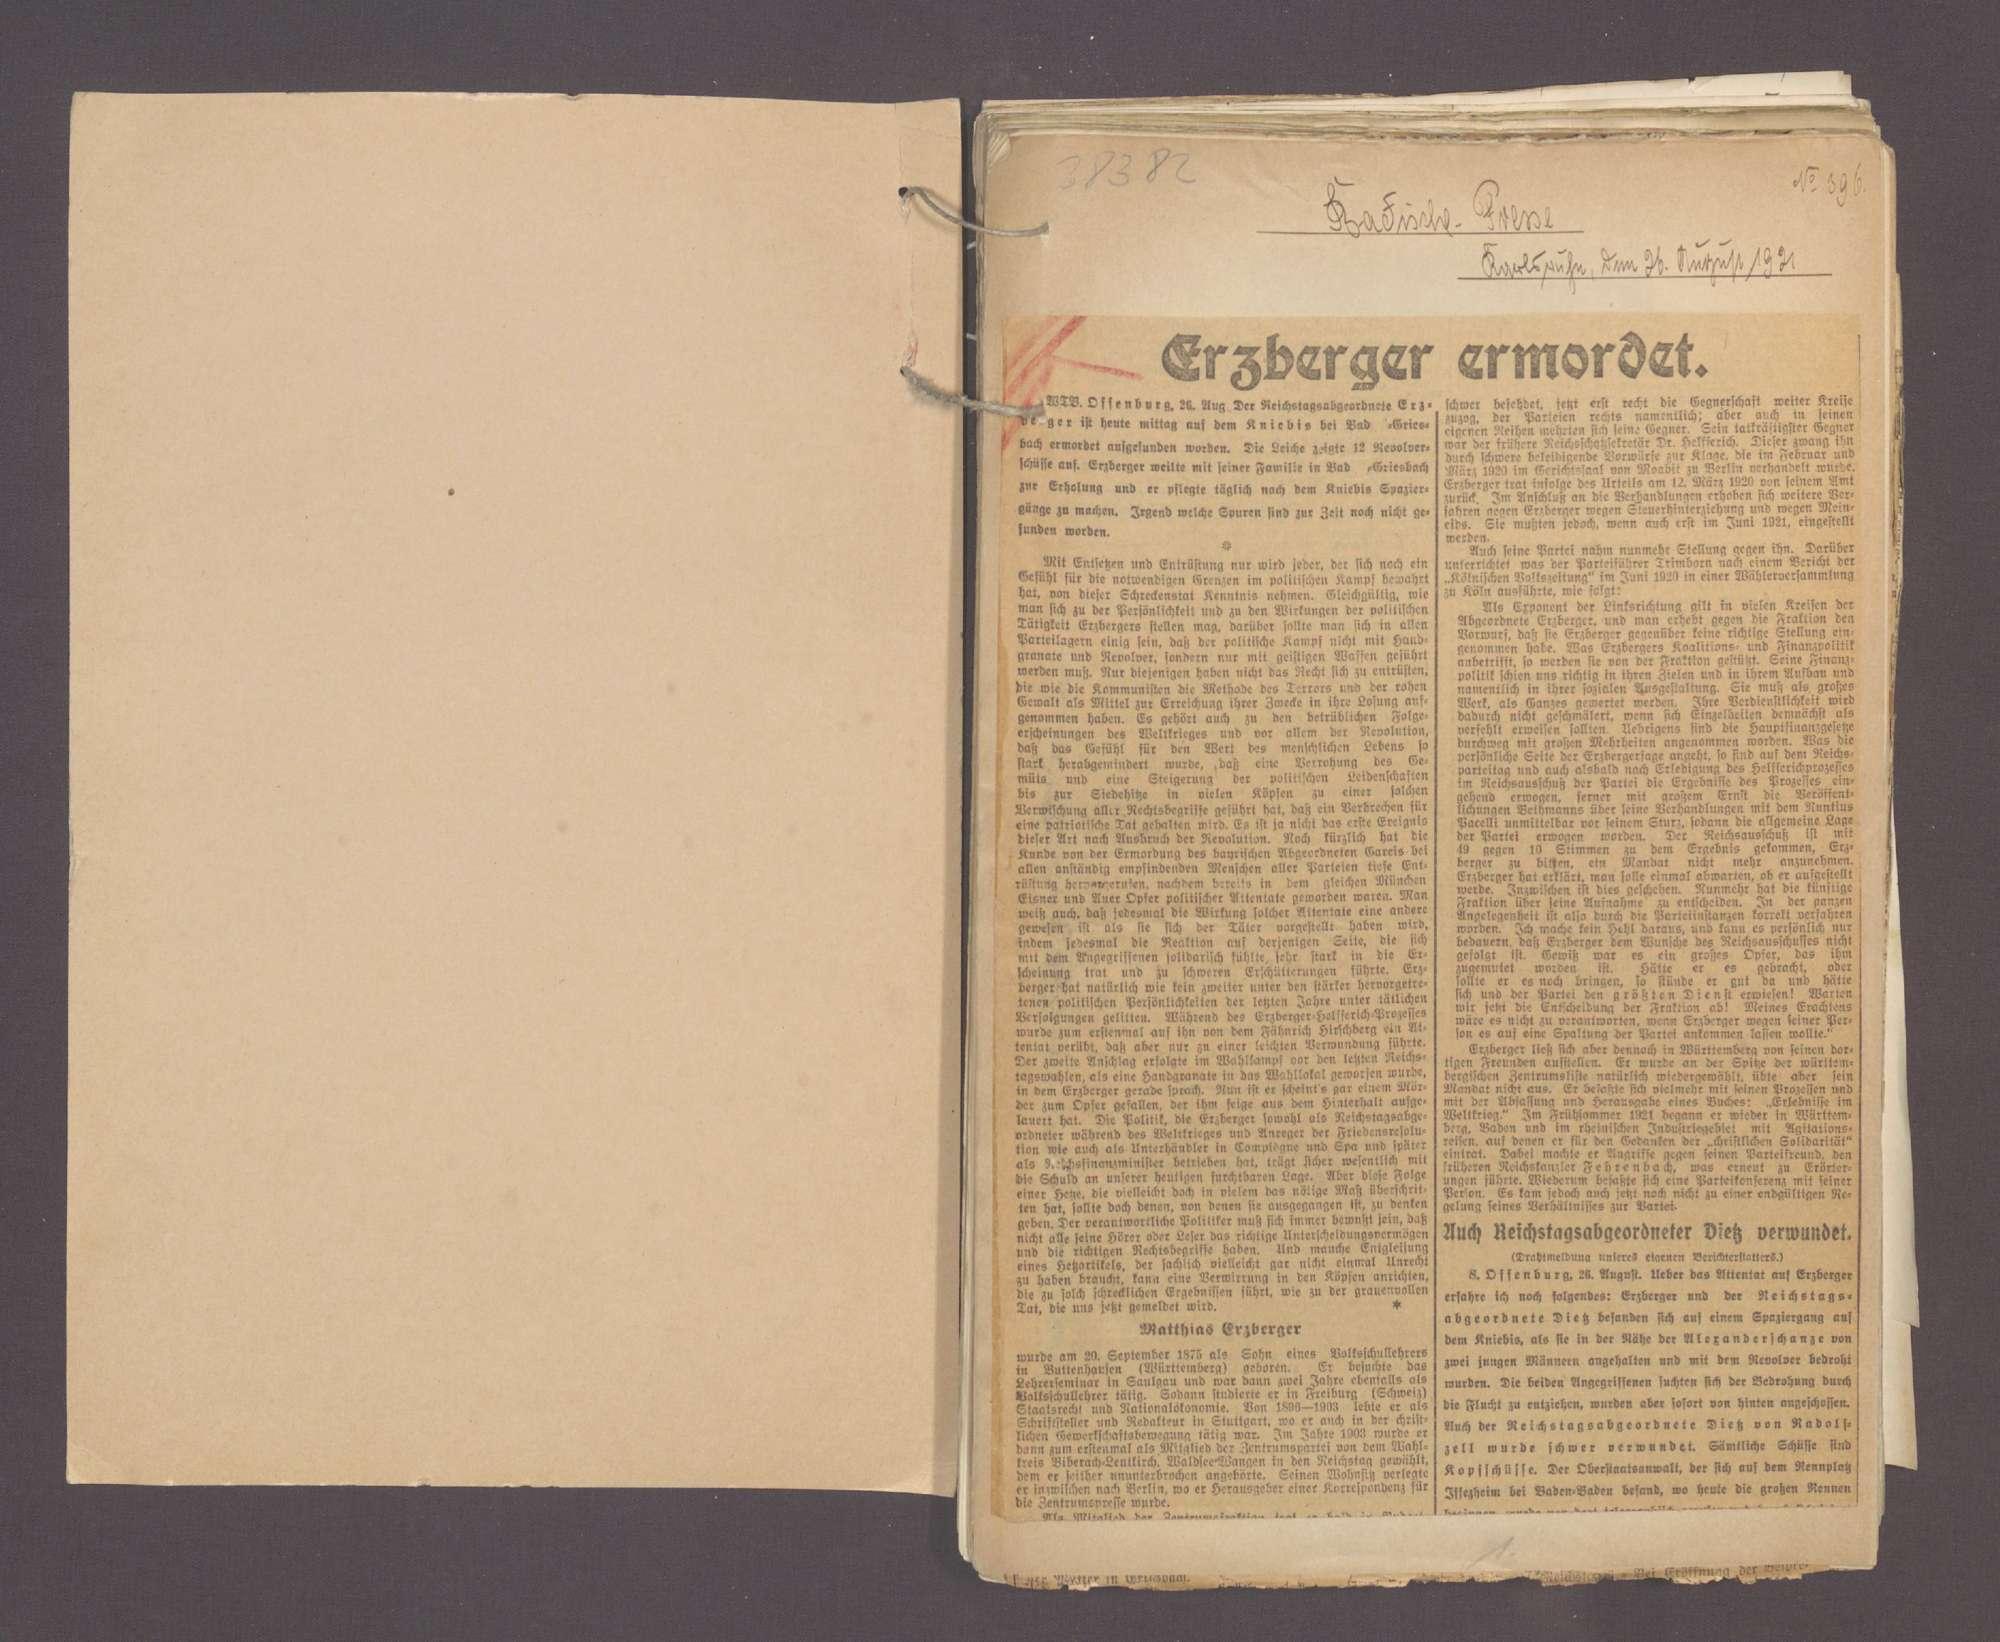 Zeitungsausschnitte zur Ermordung des Reichsfinanzmininsters a. D. Erzberger, Bild 2